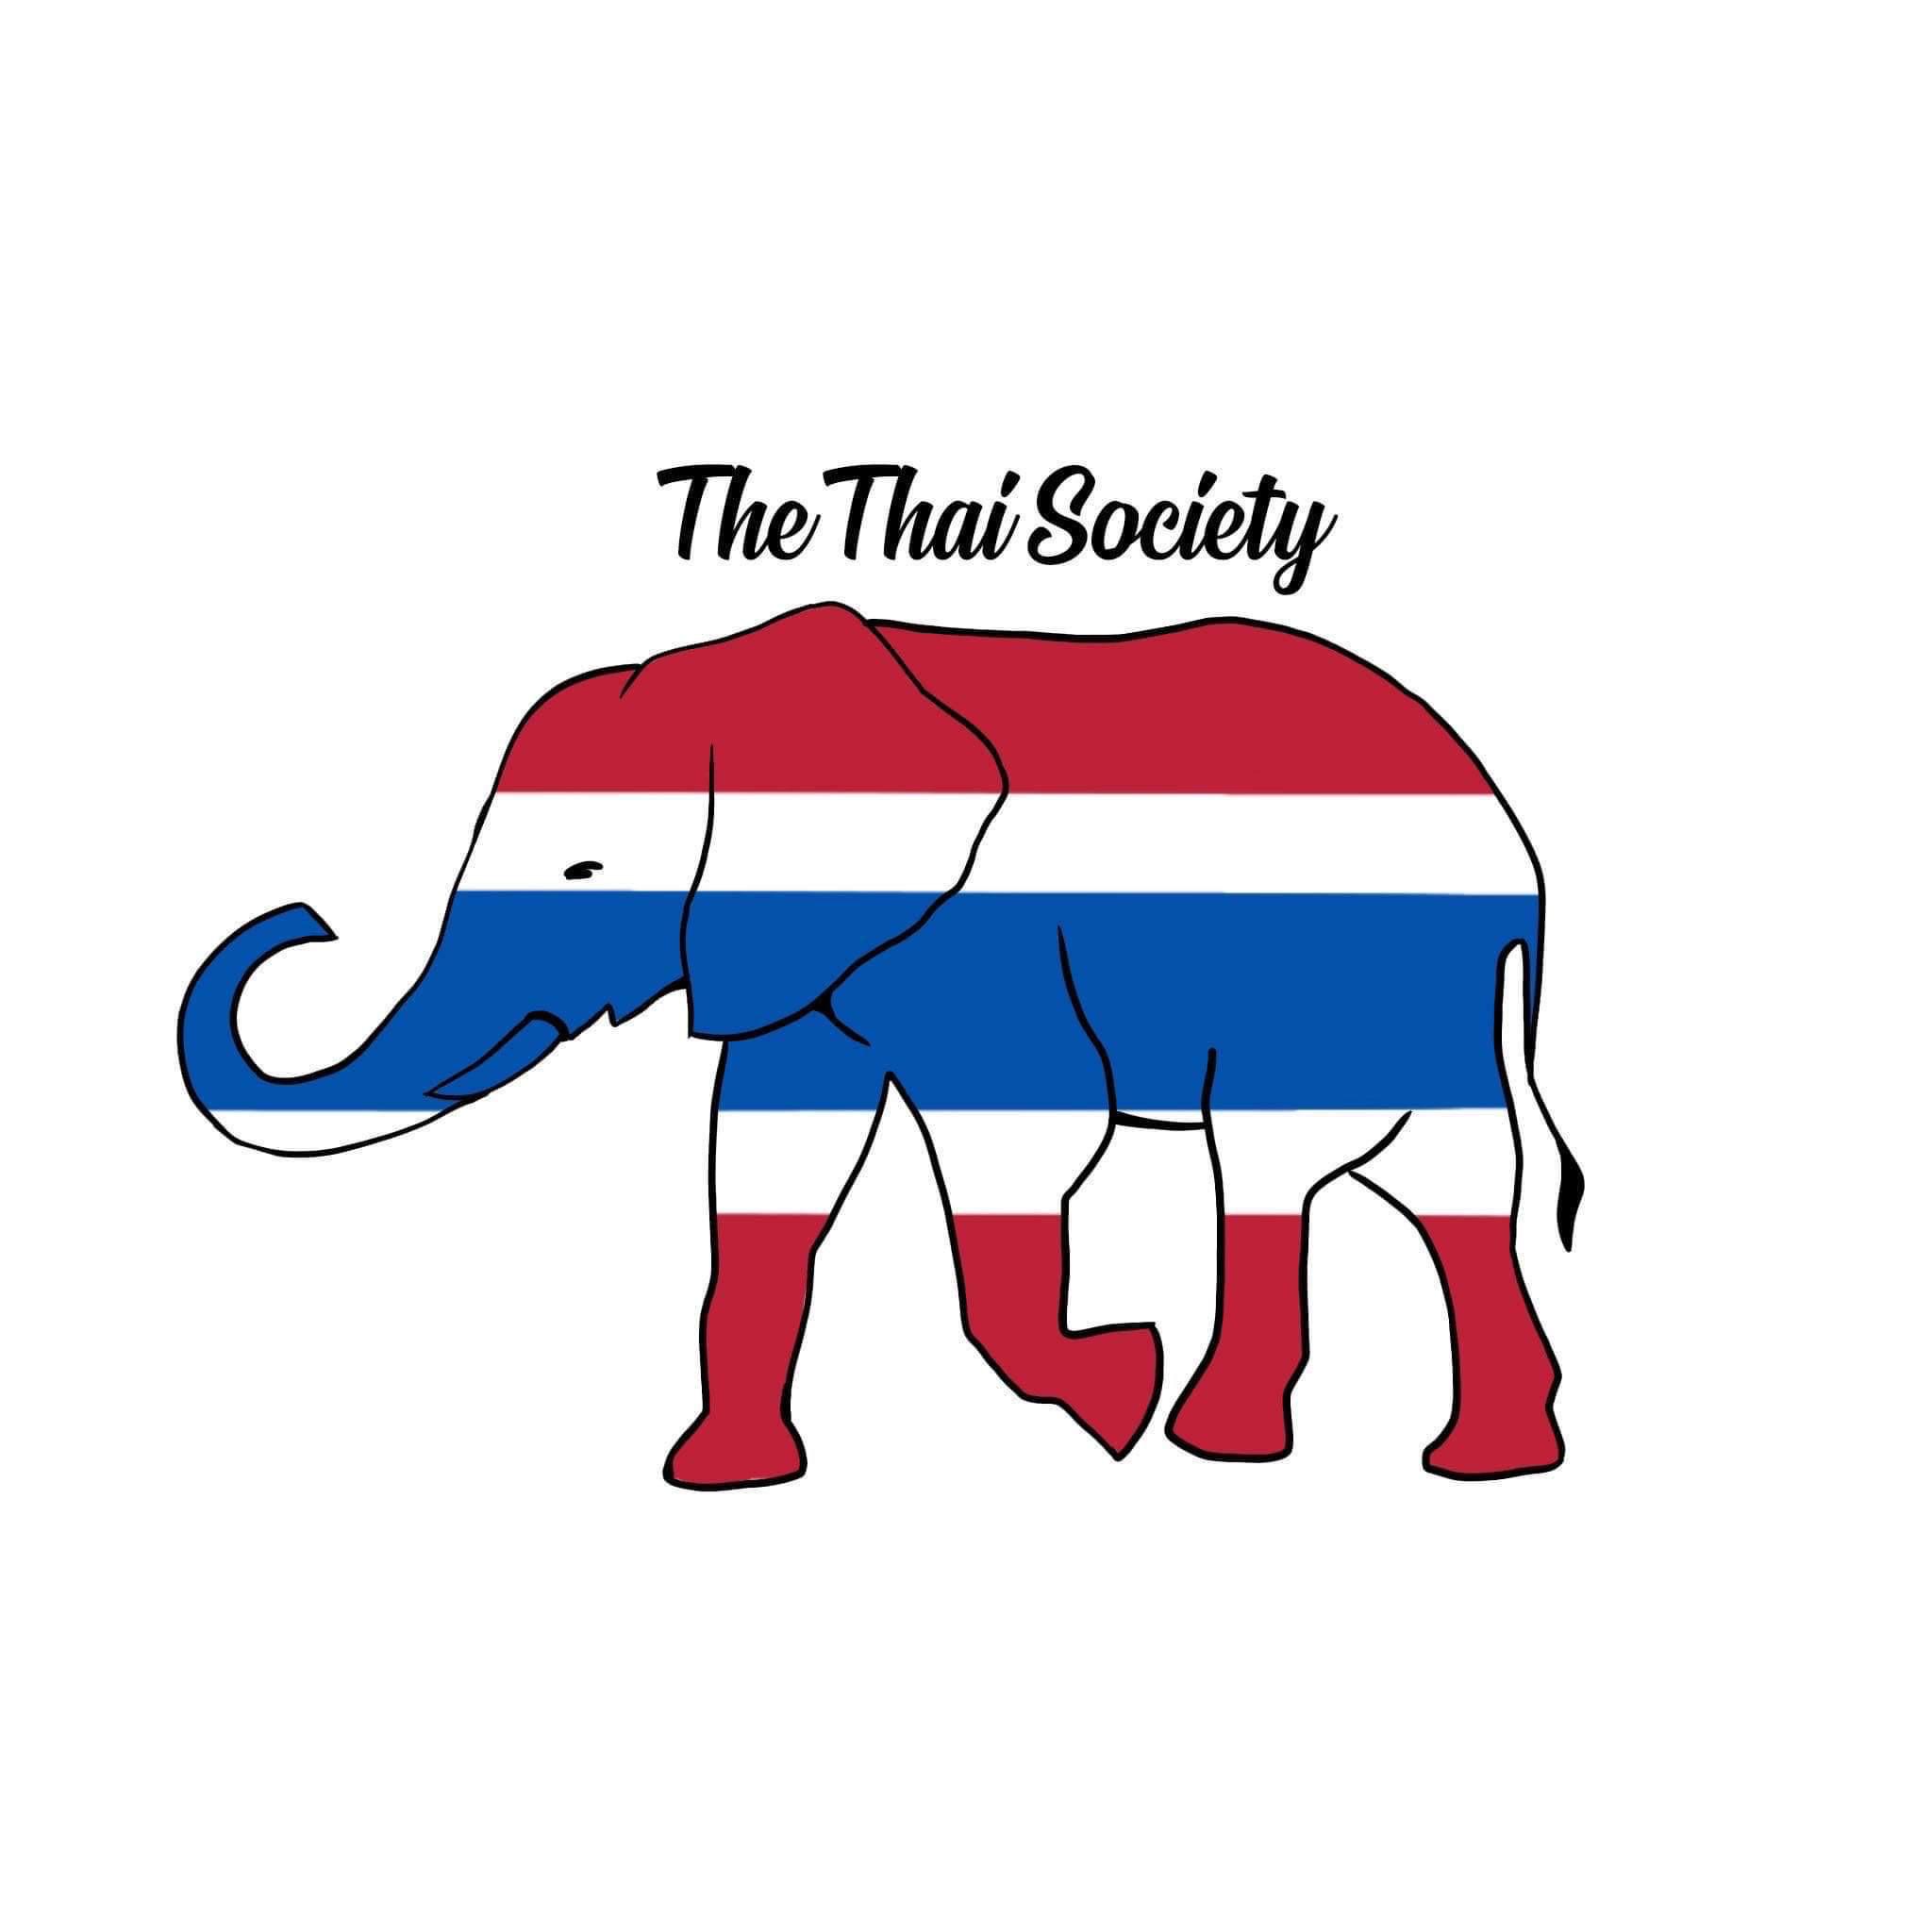 The Thai Society image